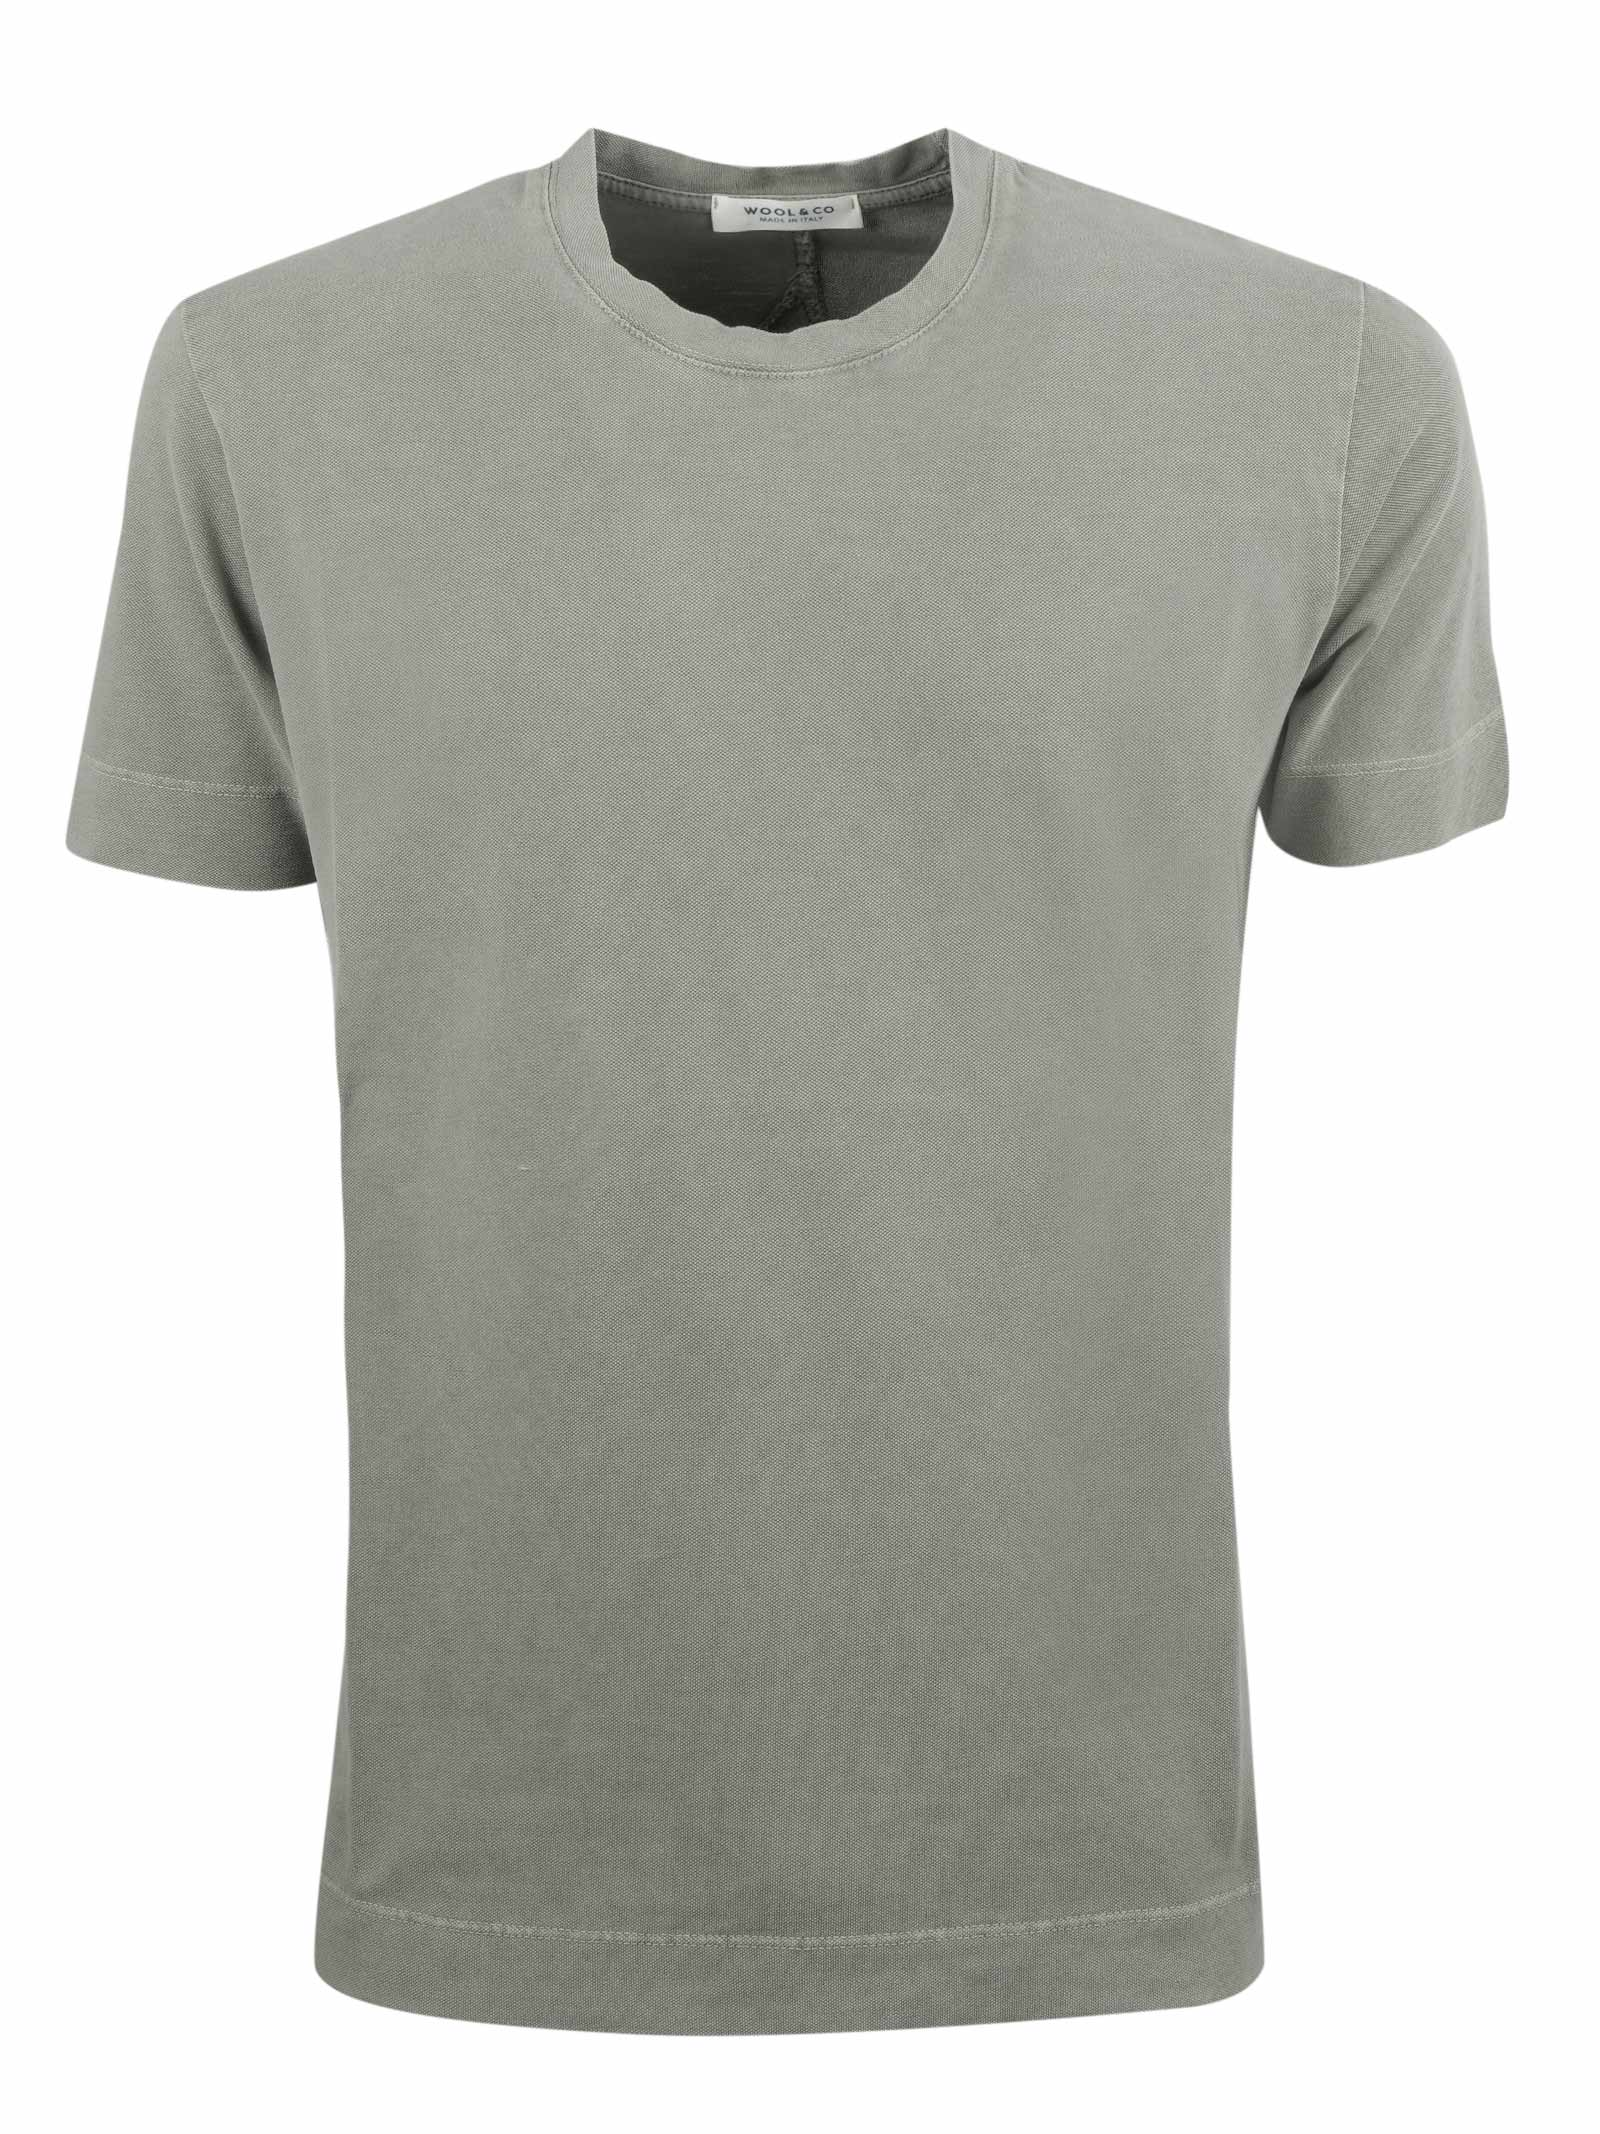 WOOL & CO. | T-shirts | 61350048